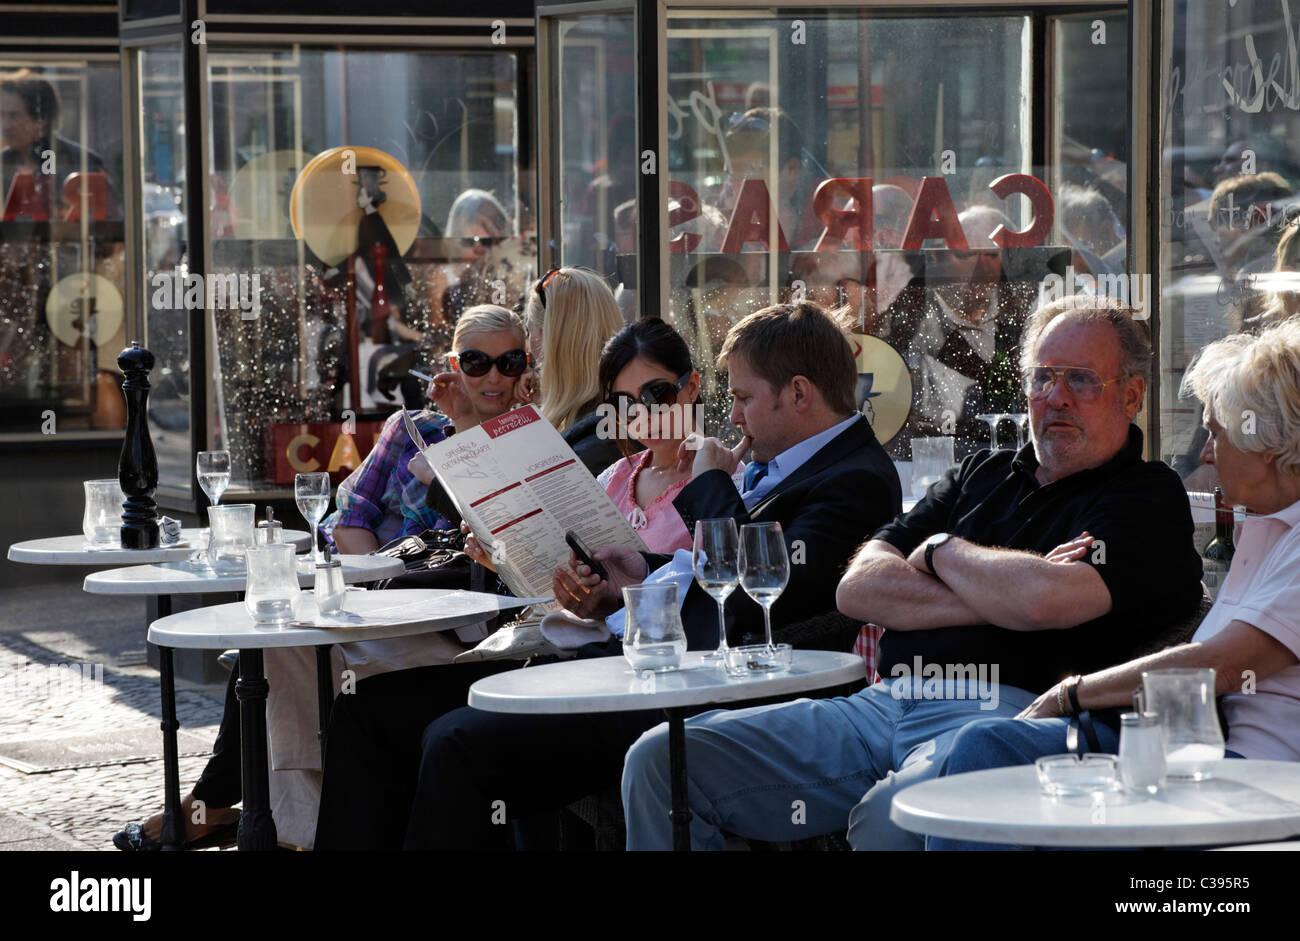 berlin cafes stock photos berlin cafes stock images alamy. Black Bedroom Furniture Sets. Home Design Ideas